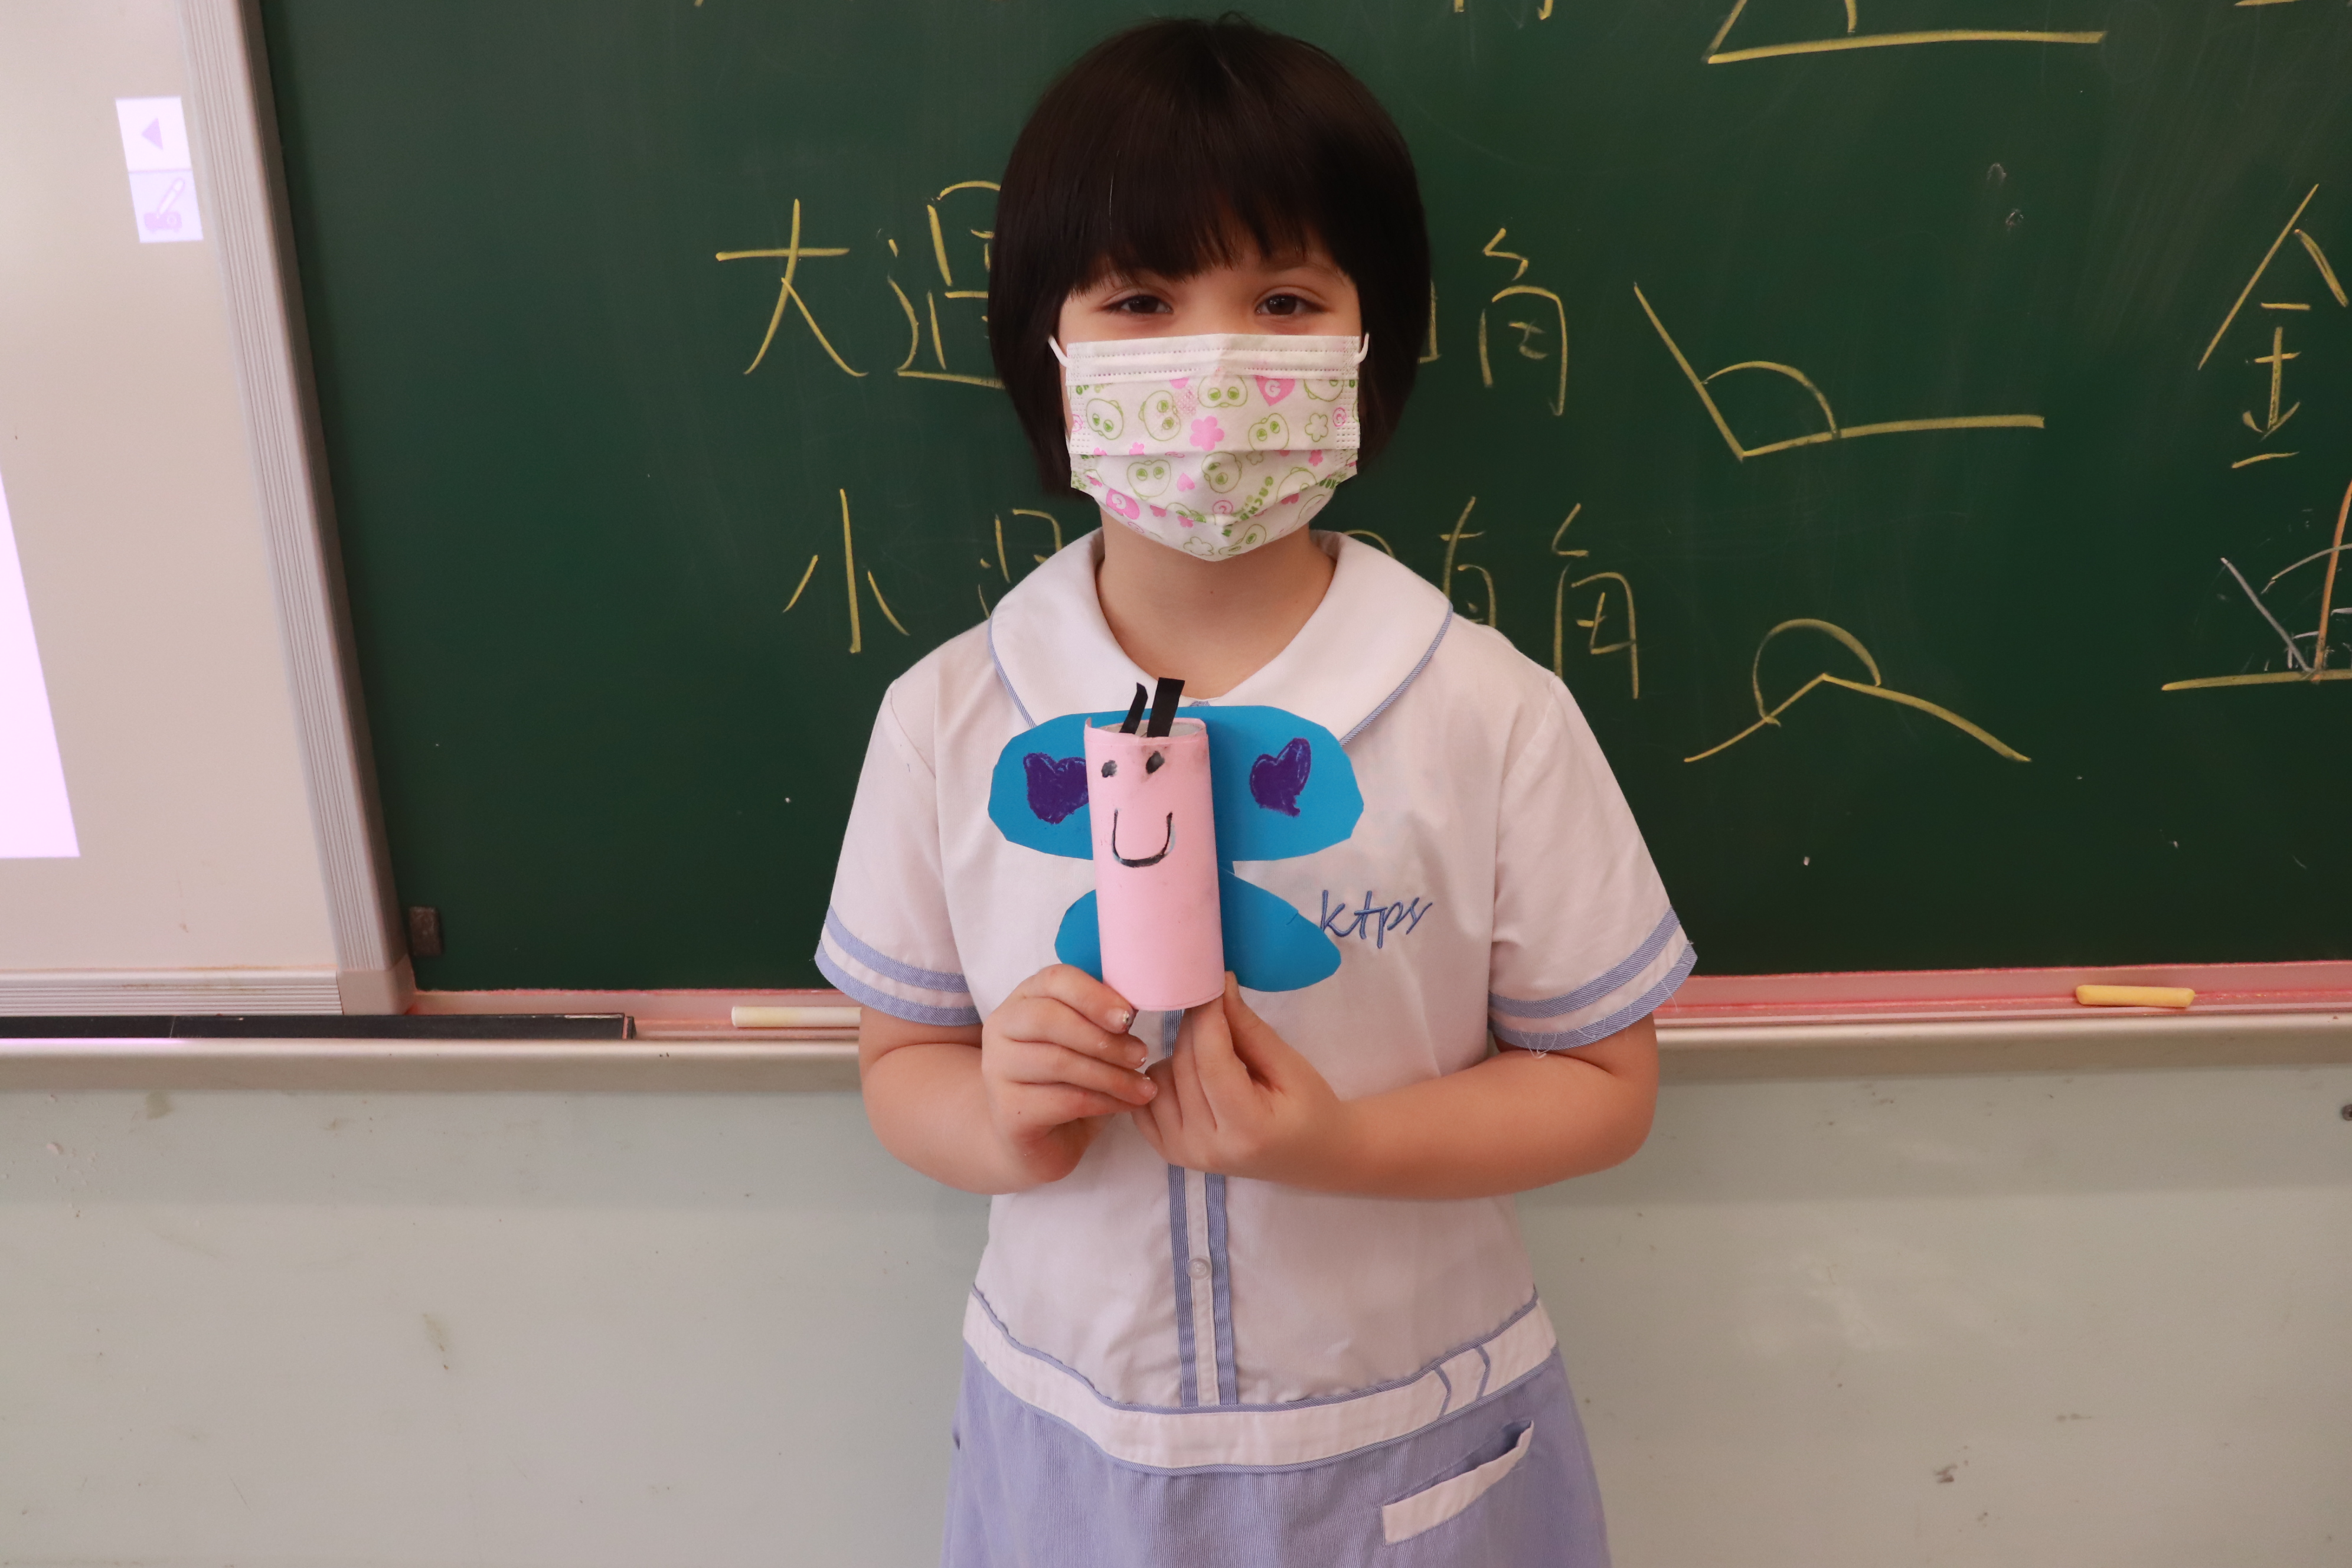 http://keito.school.hk/sites/default/files/img_6799.jpg